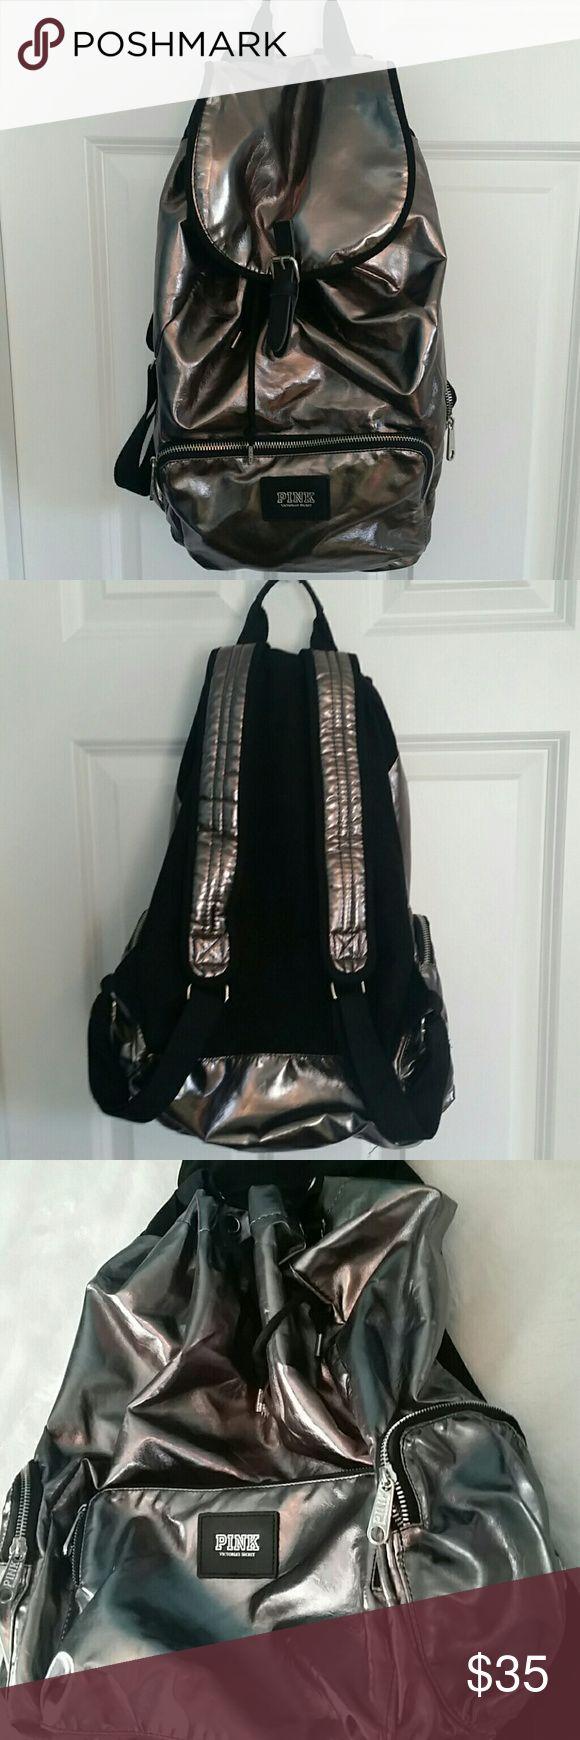 25 best ideas about kipling backpack on pinterest school handbags - Nwot Pinj Vs Metallic Silver Backpack Never Used Victoria Secret Backpack Fabric